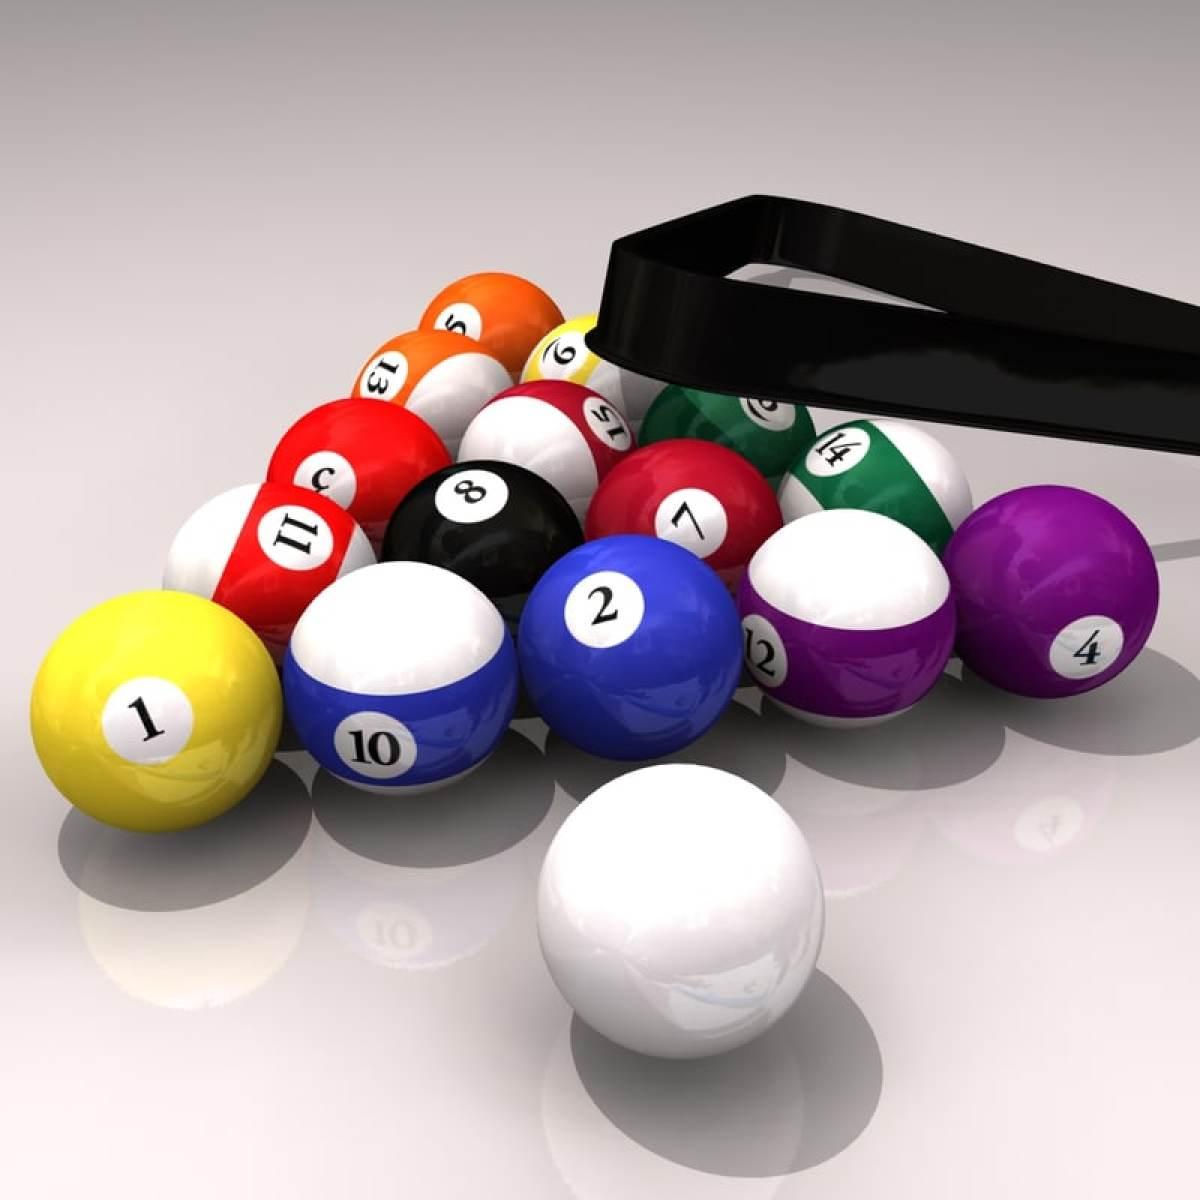 billiard balls 3d models and textures | turbosquid